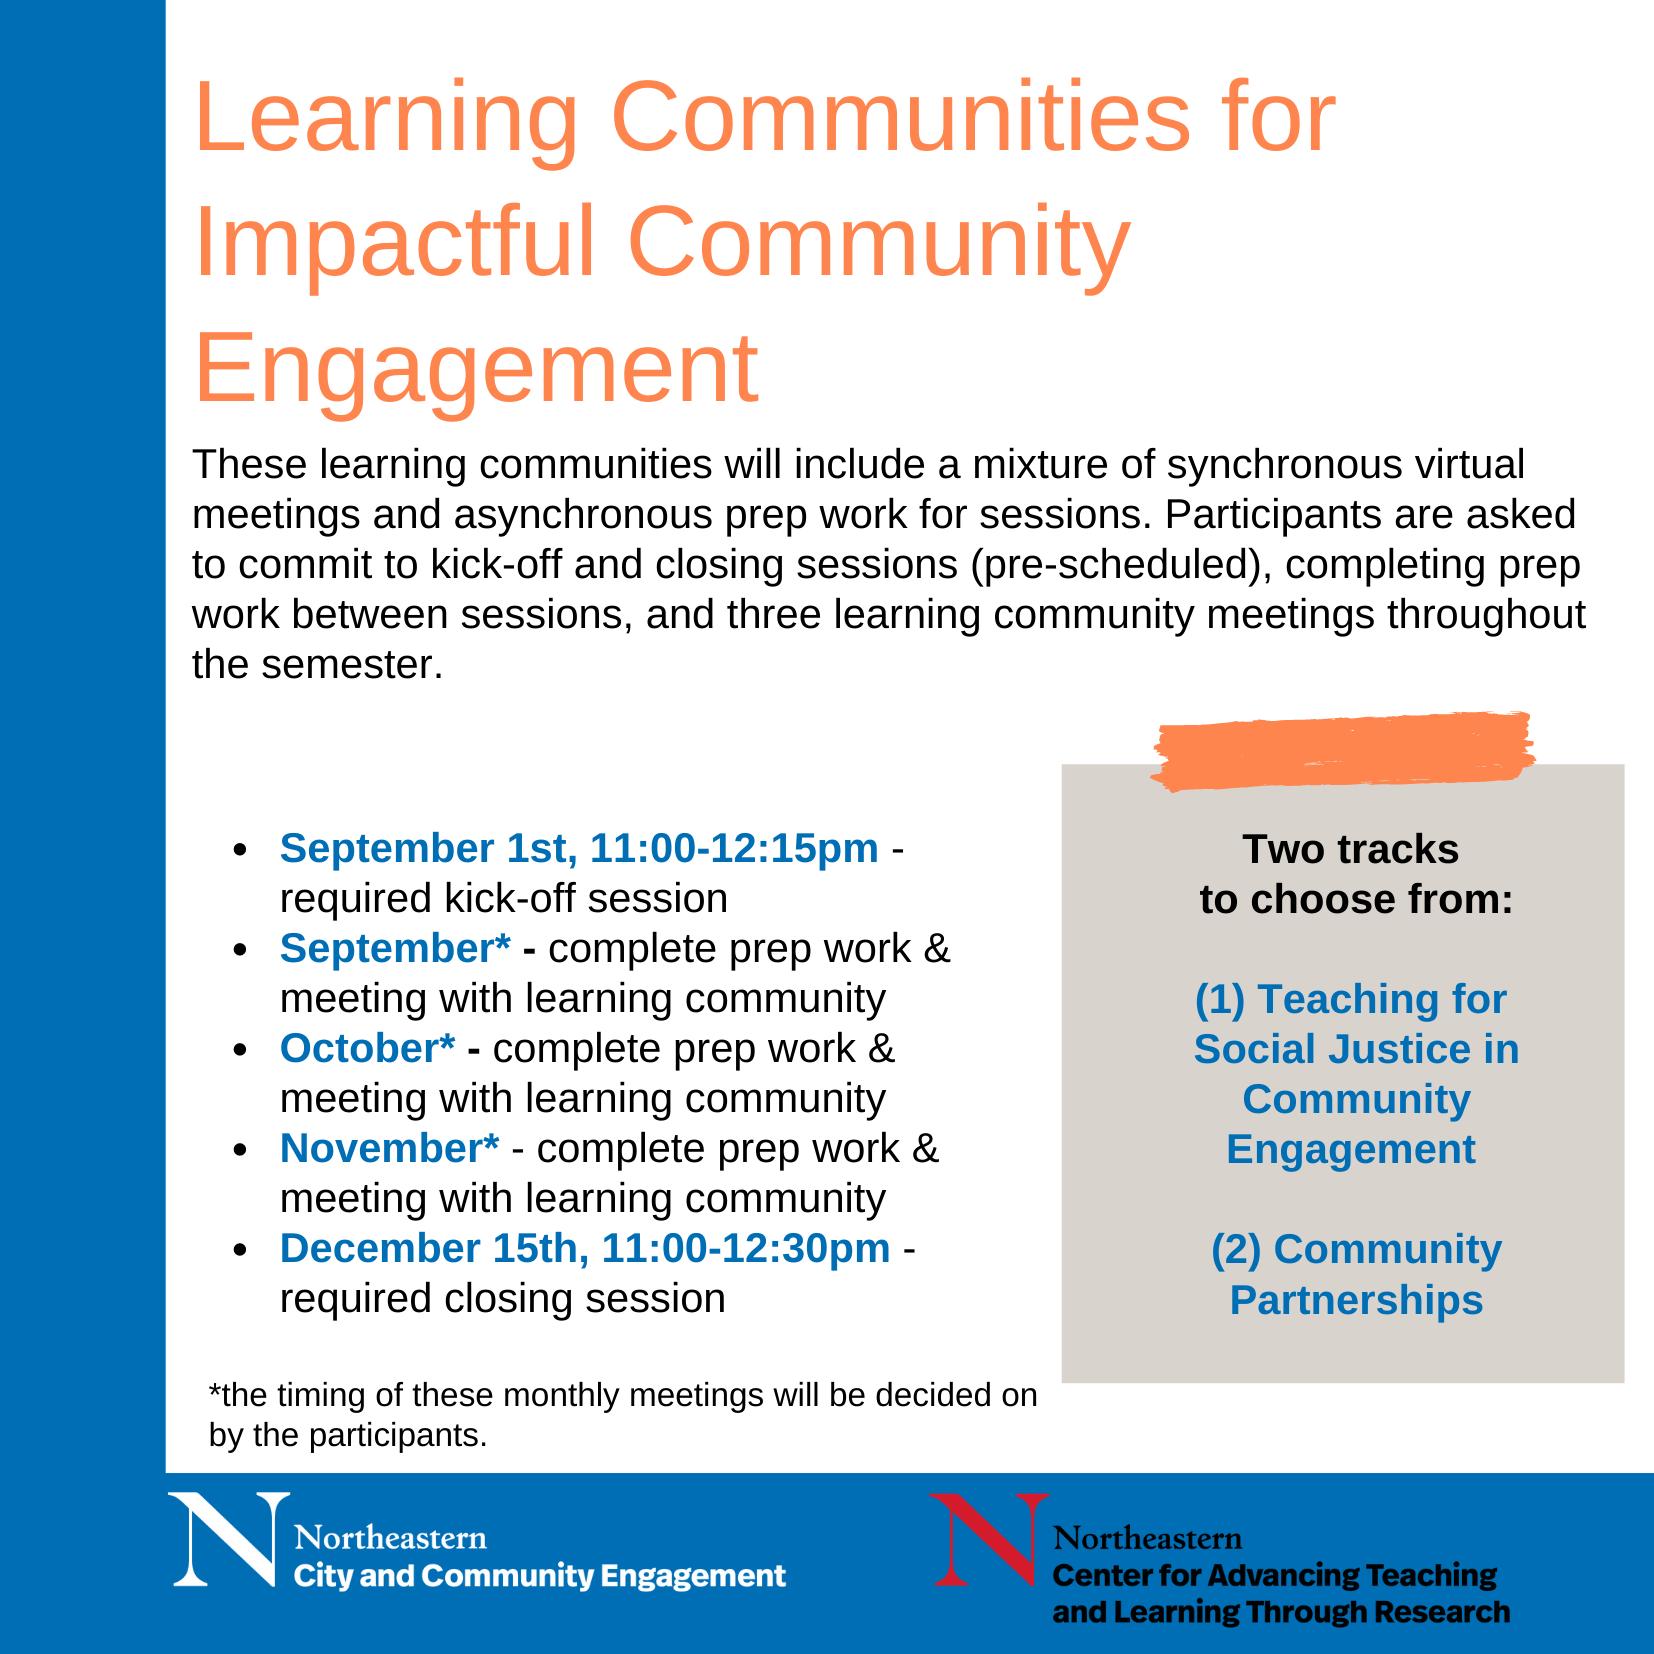 Learning Communities for Impactful Community Engagement: Community Partnerships